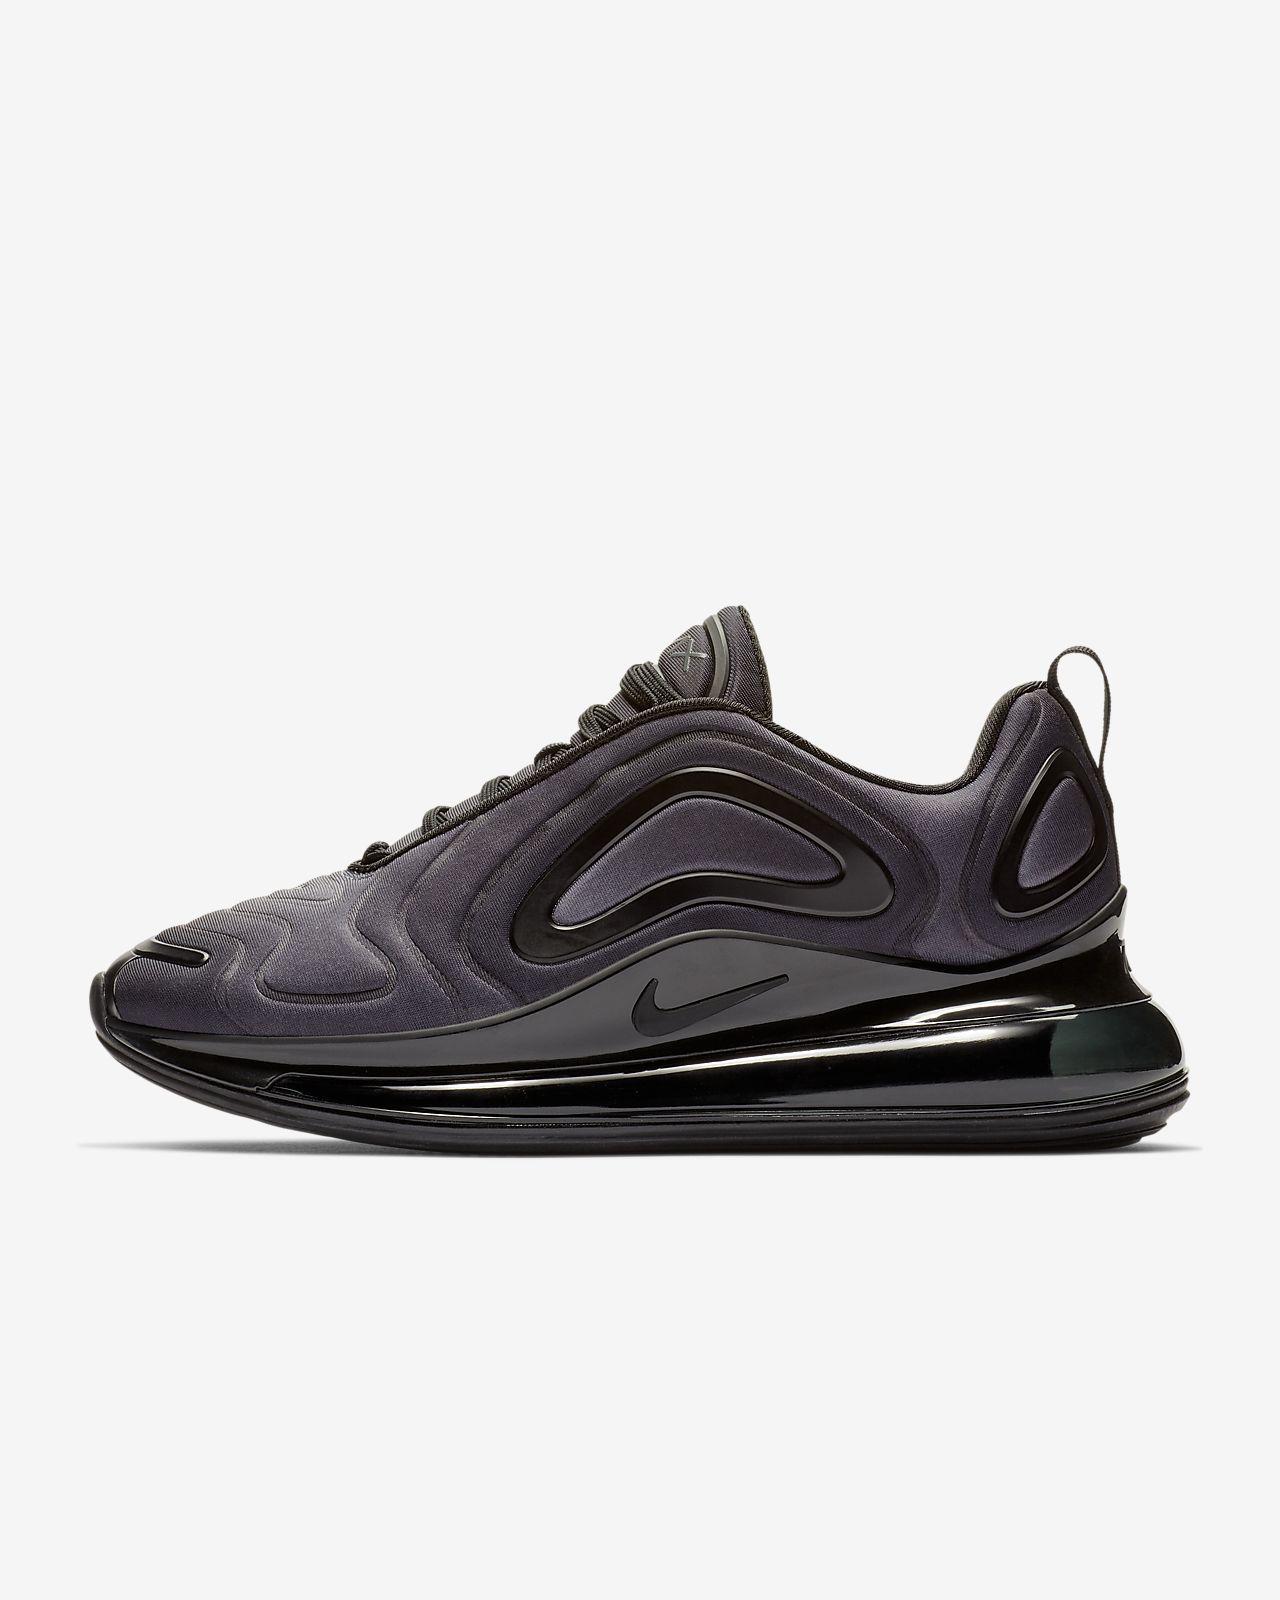 promo code a0963 321f1 ... Chaussure Nike Air Max 720 pour Femme